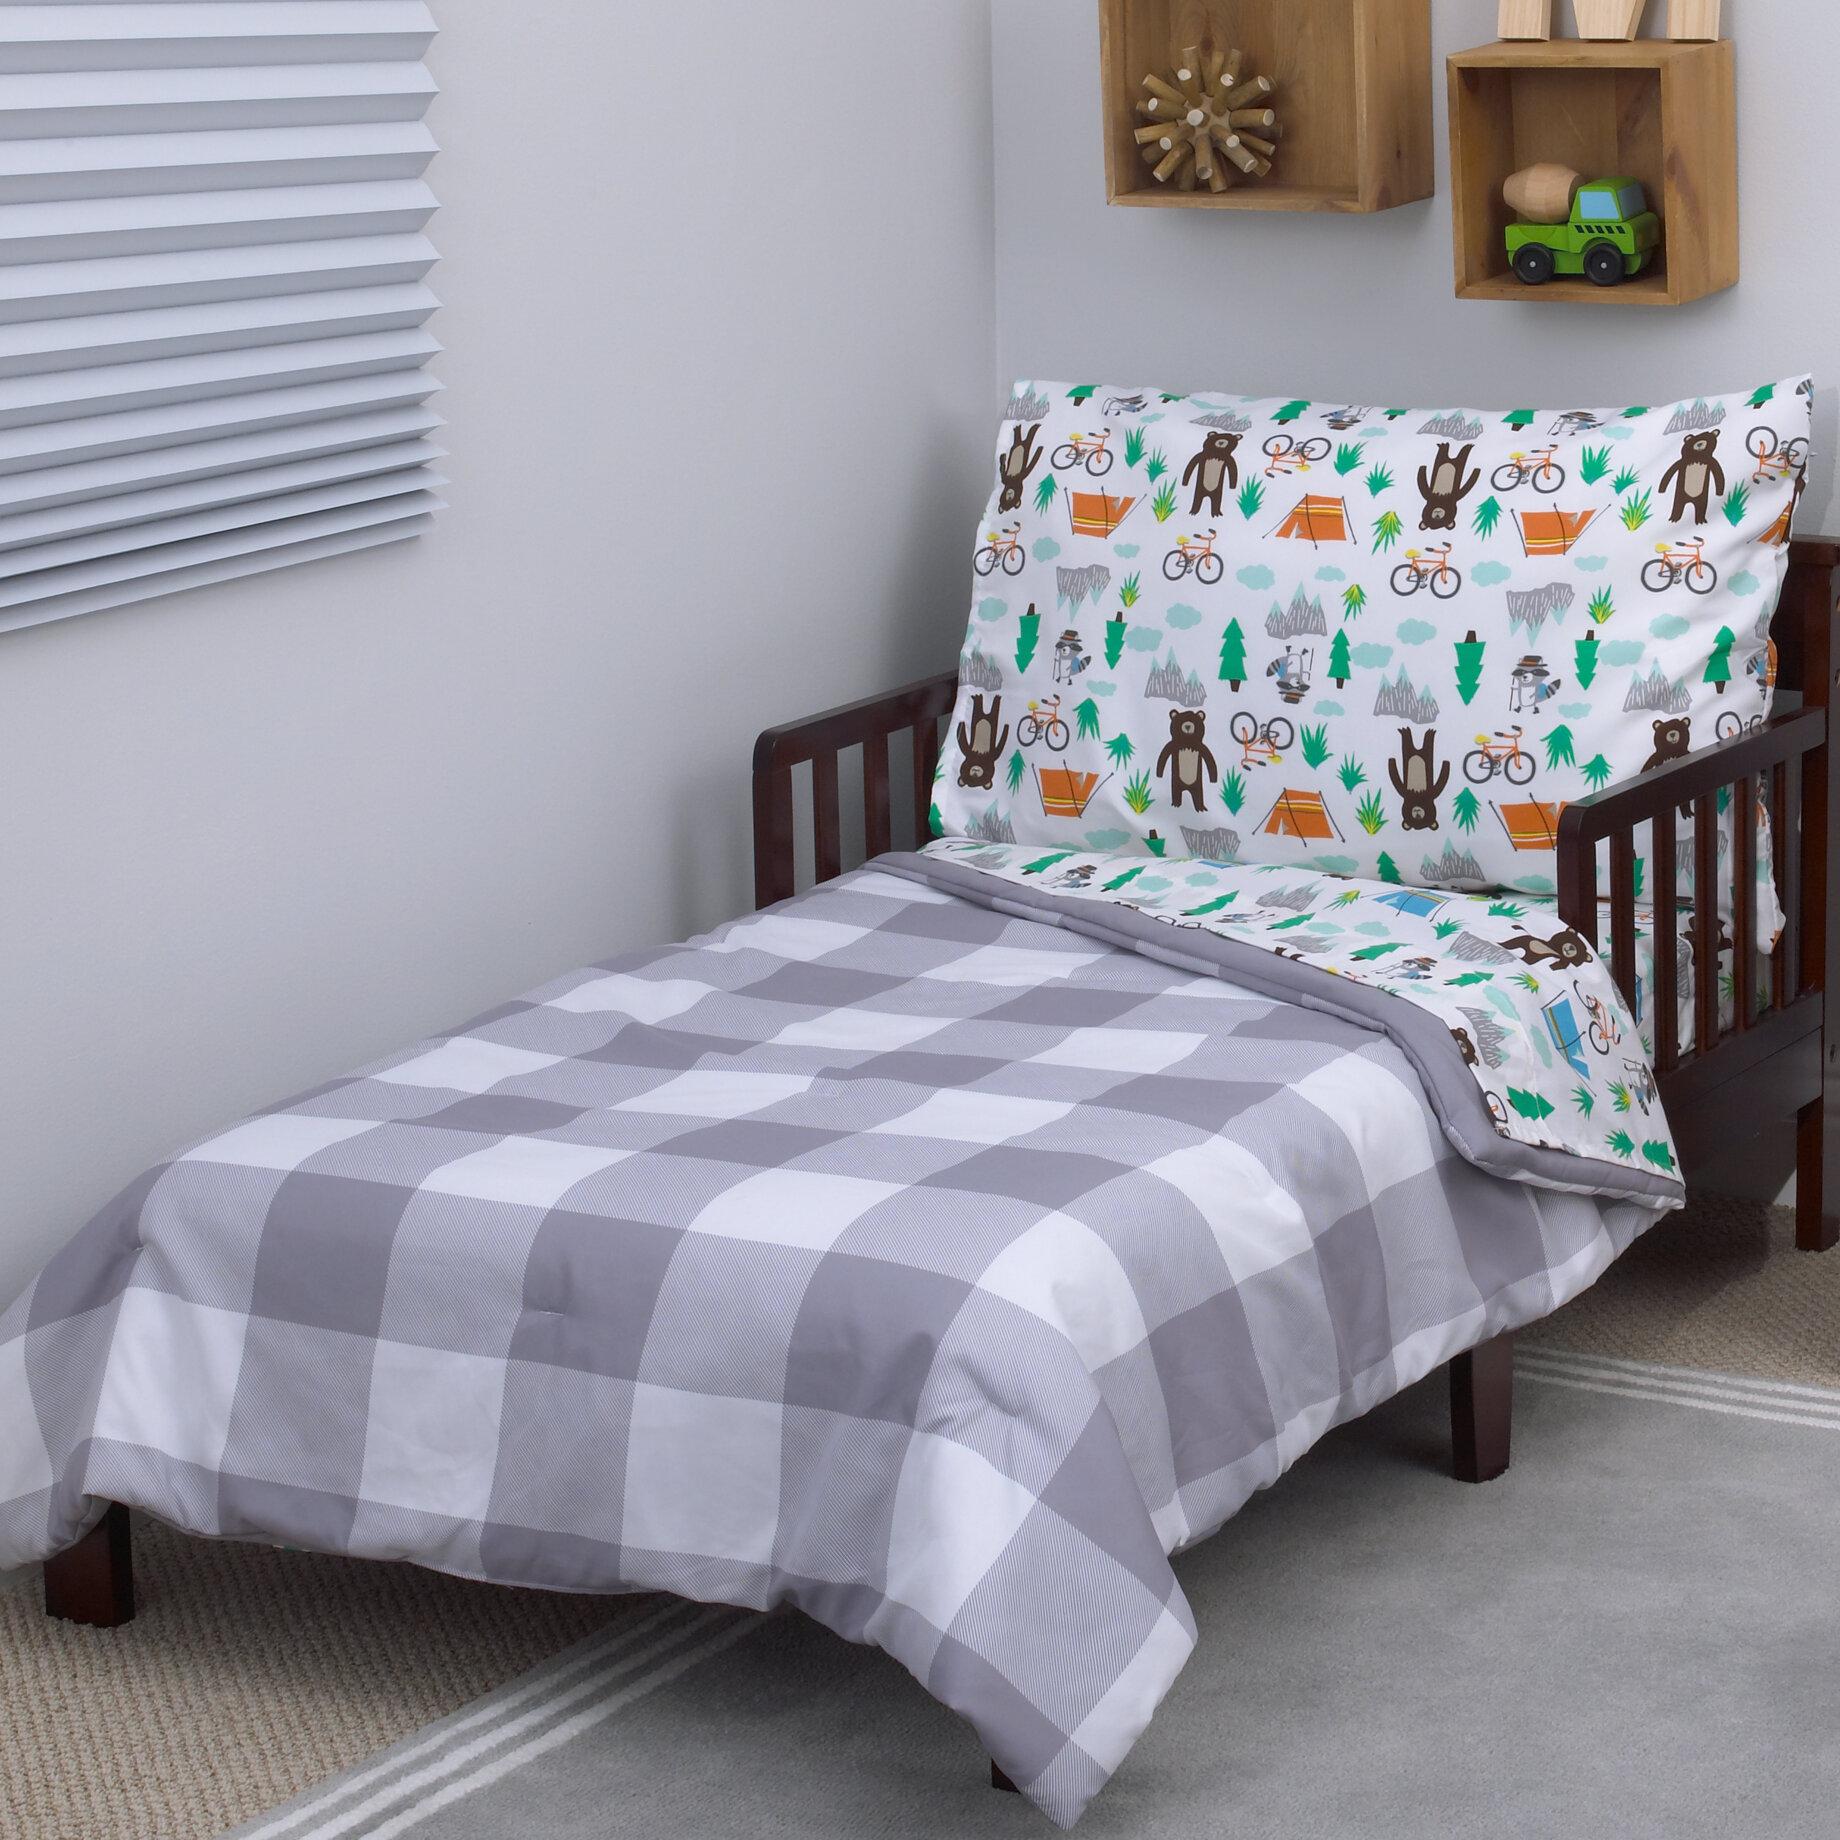 carters woodland boy 4 piece toddler bedding set wayfair - Toddler Bedding